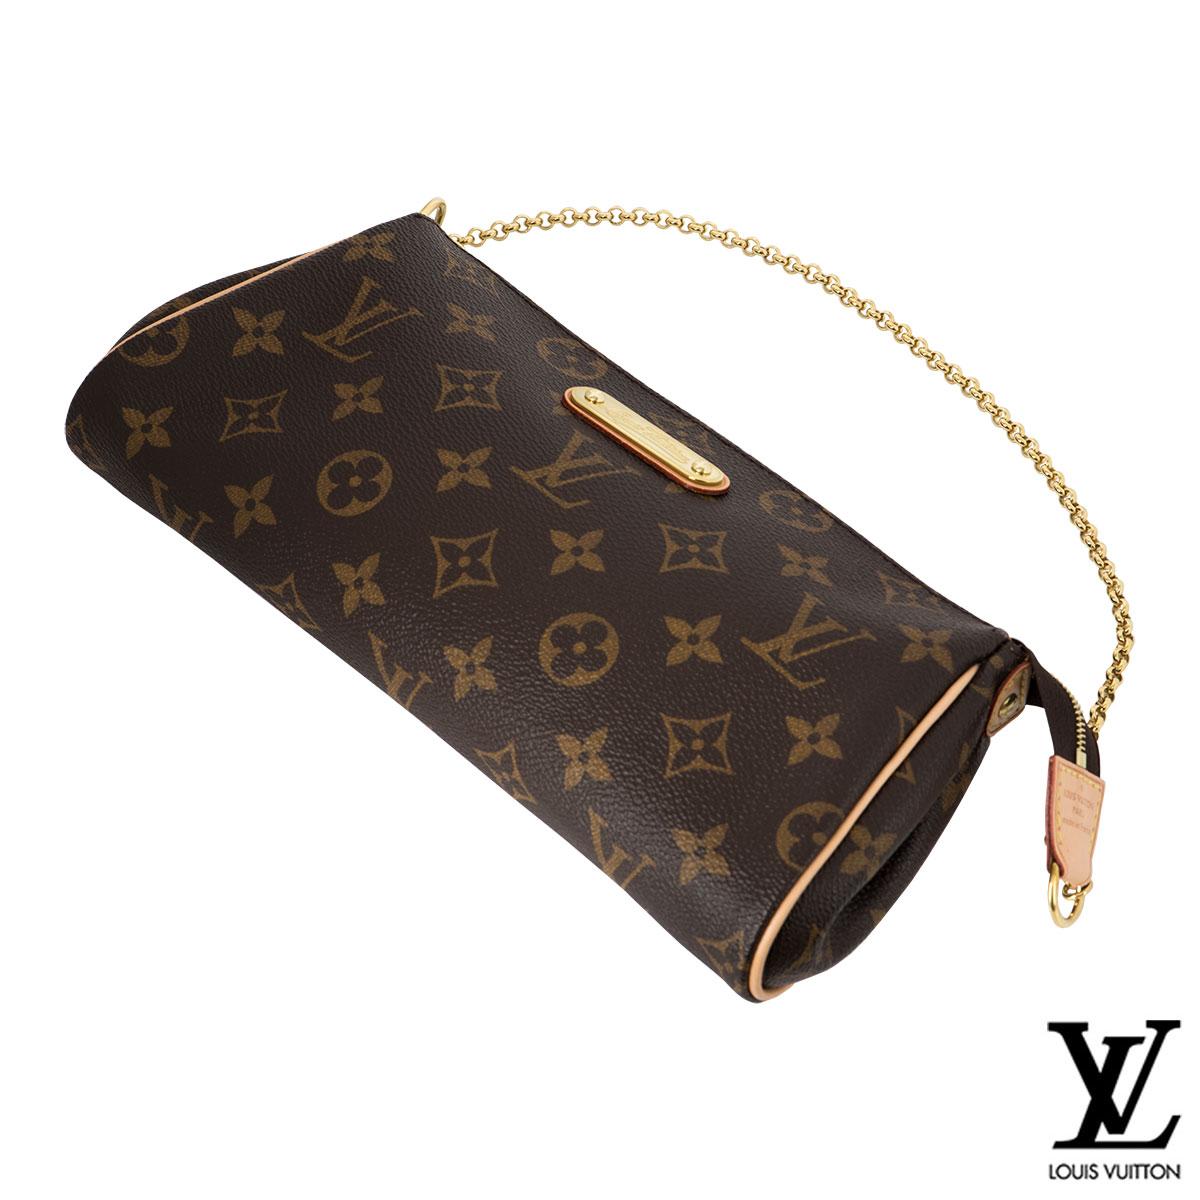 Louis Vuitton Monogram Eva Clutch Bag